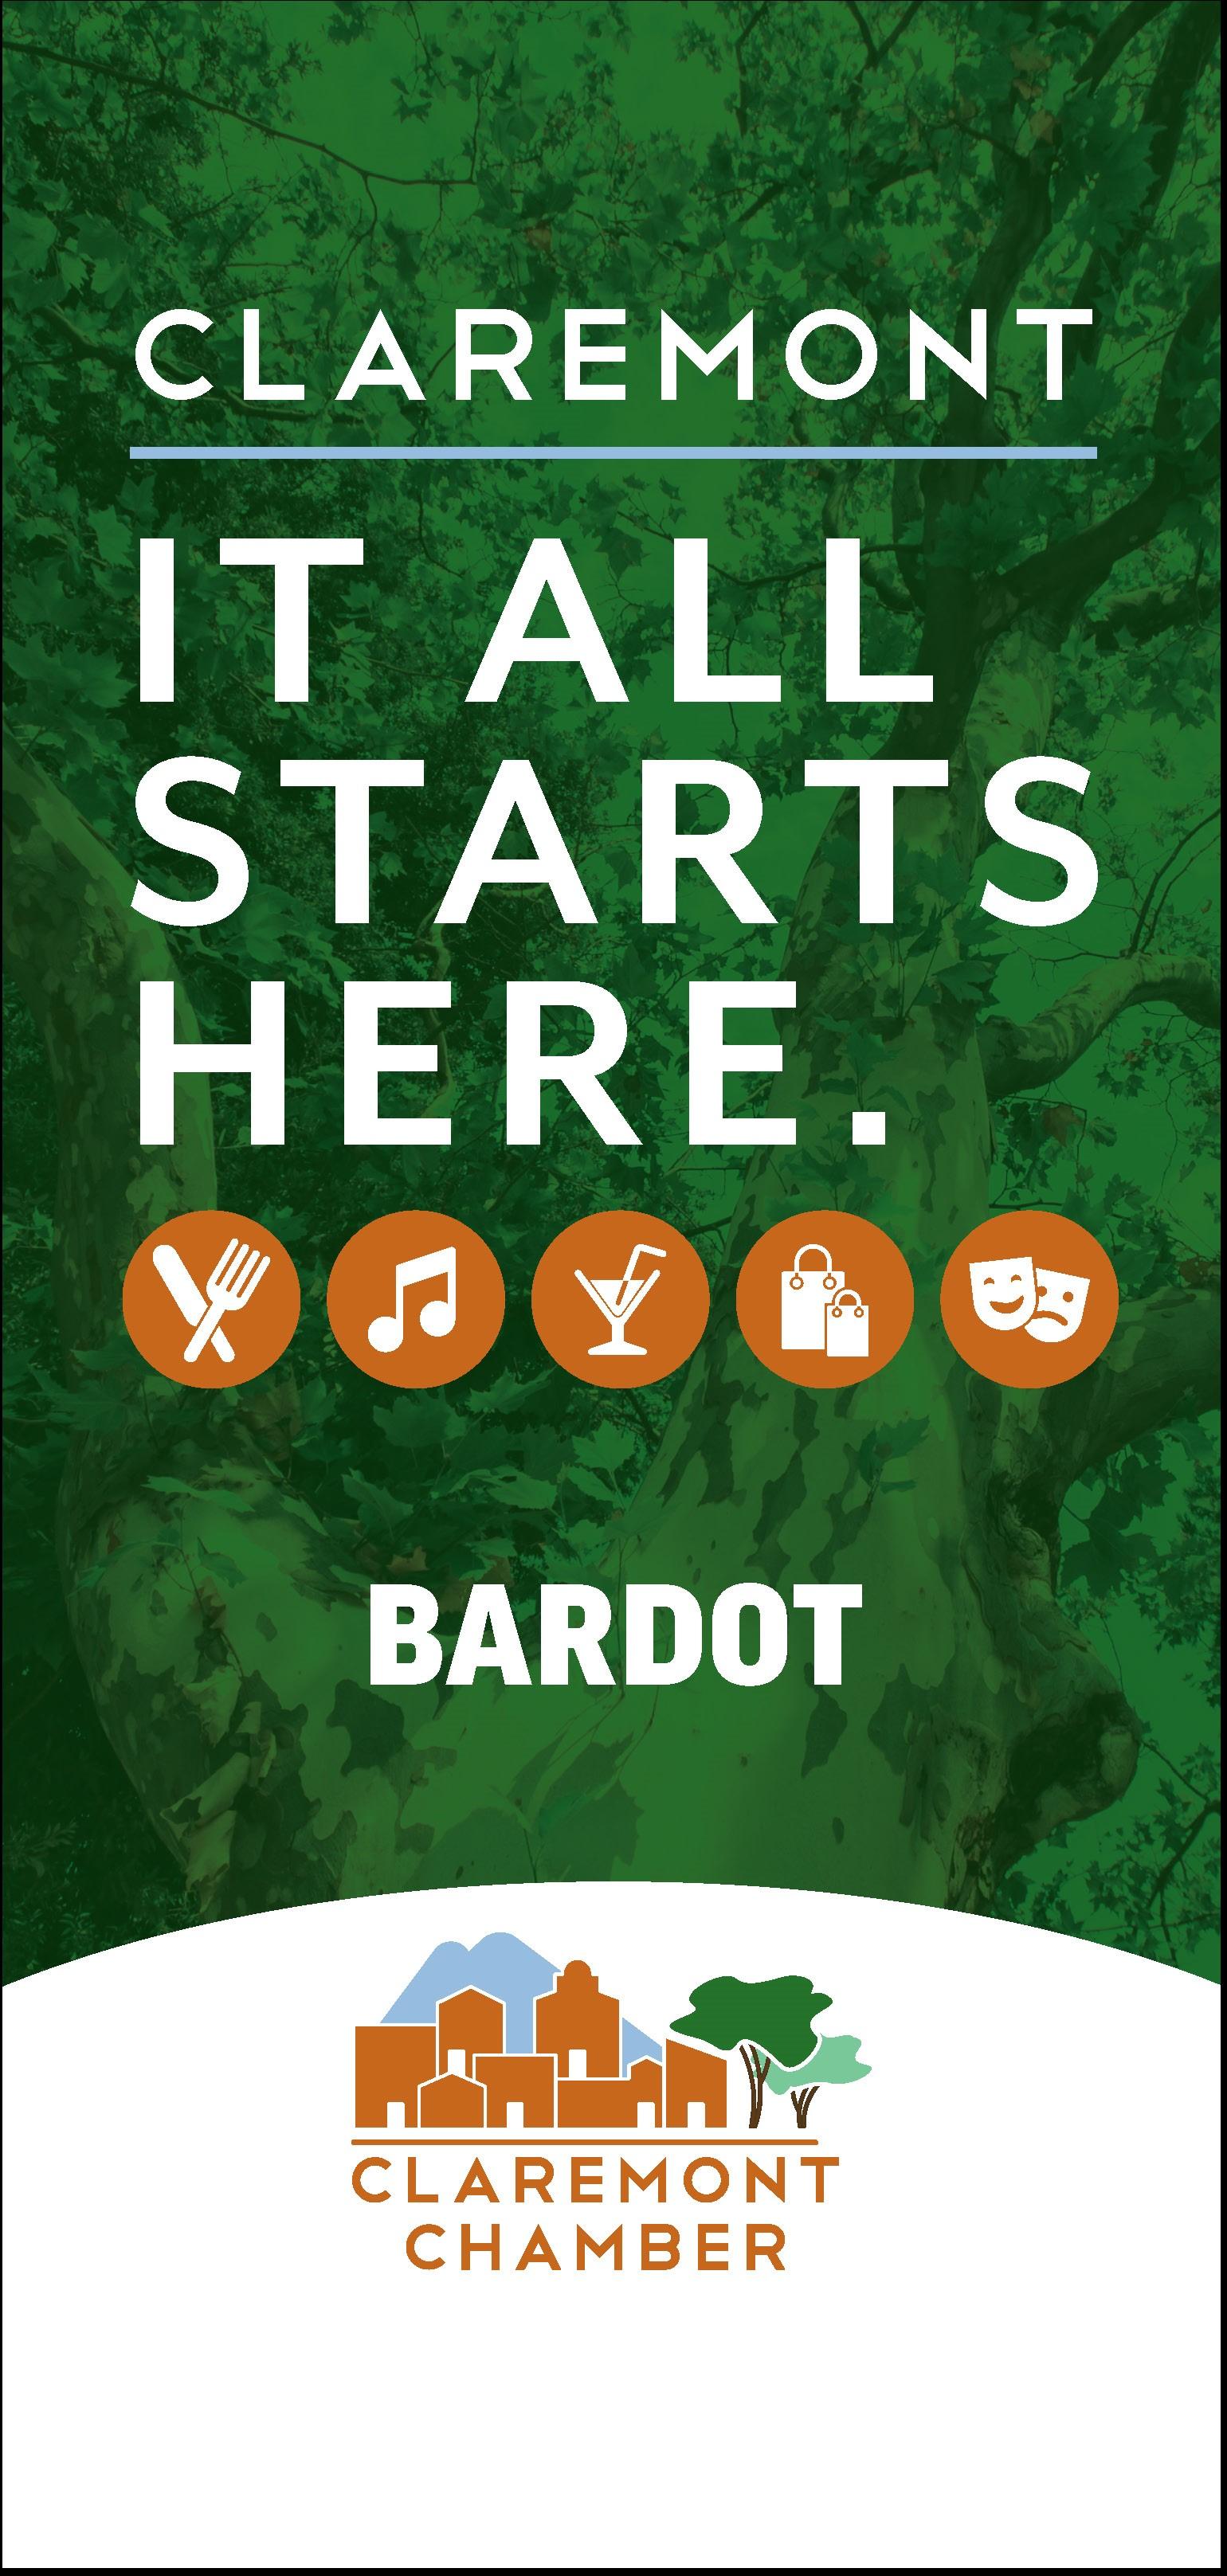 Bardot Outlined Banner